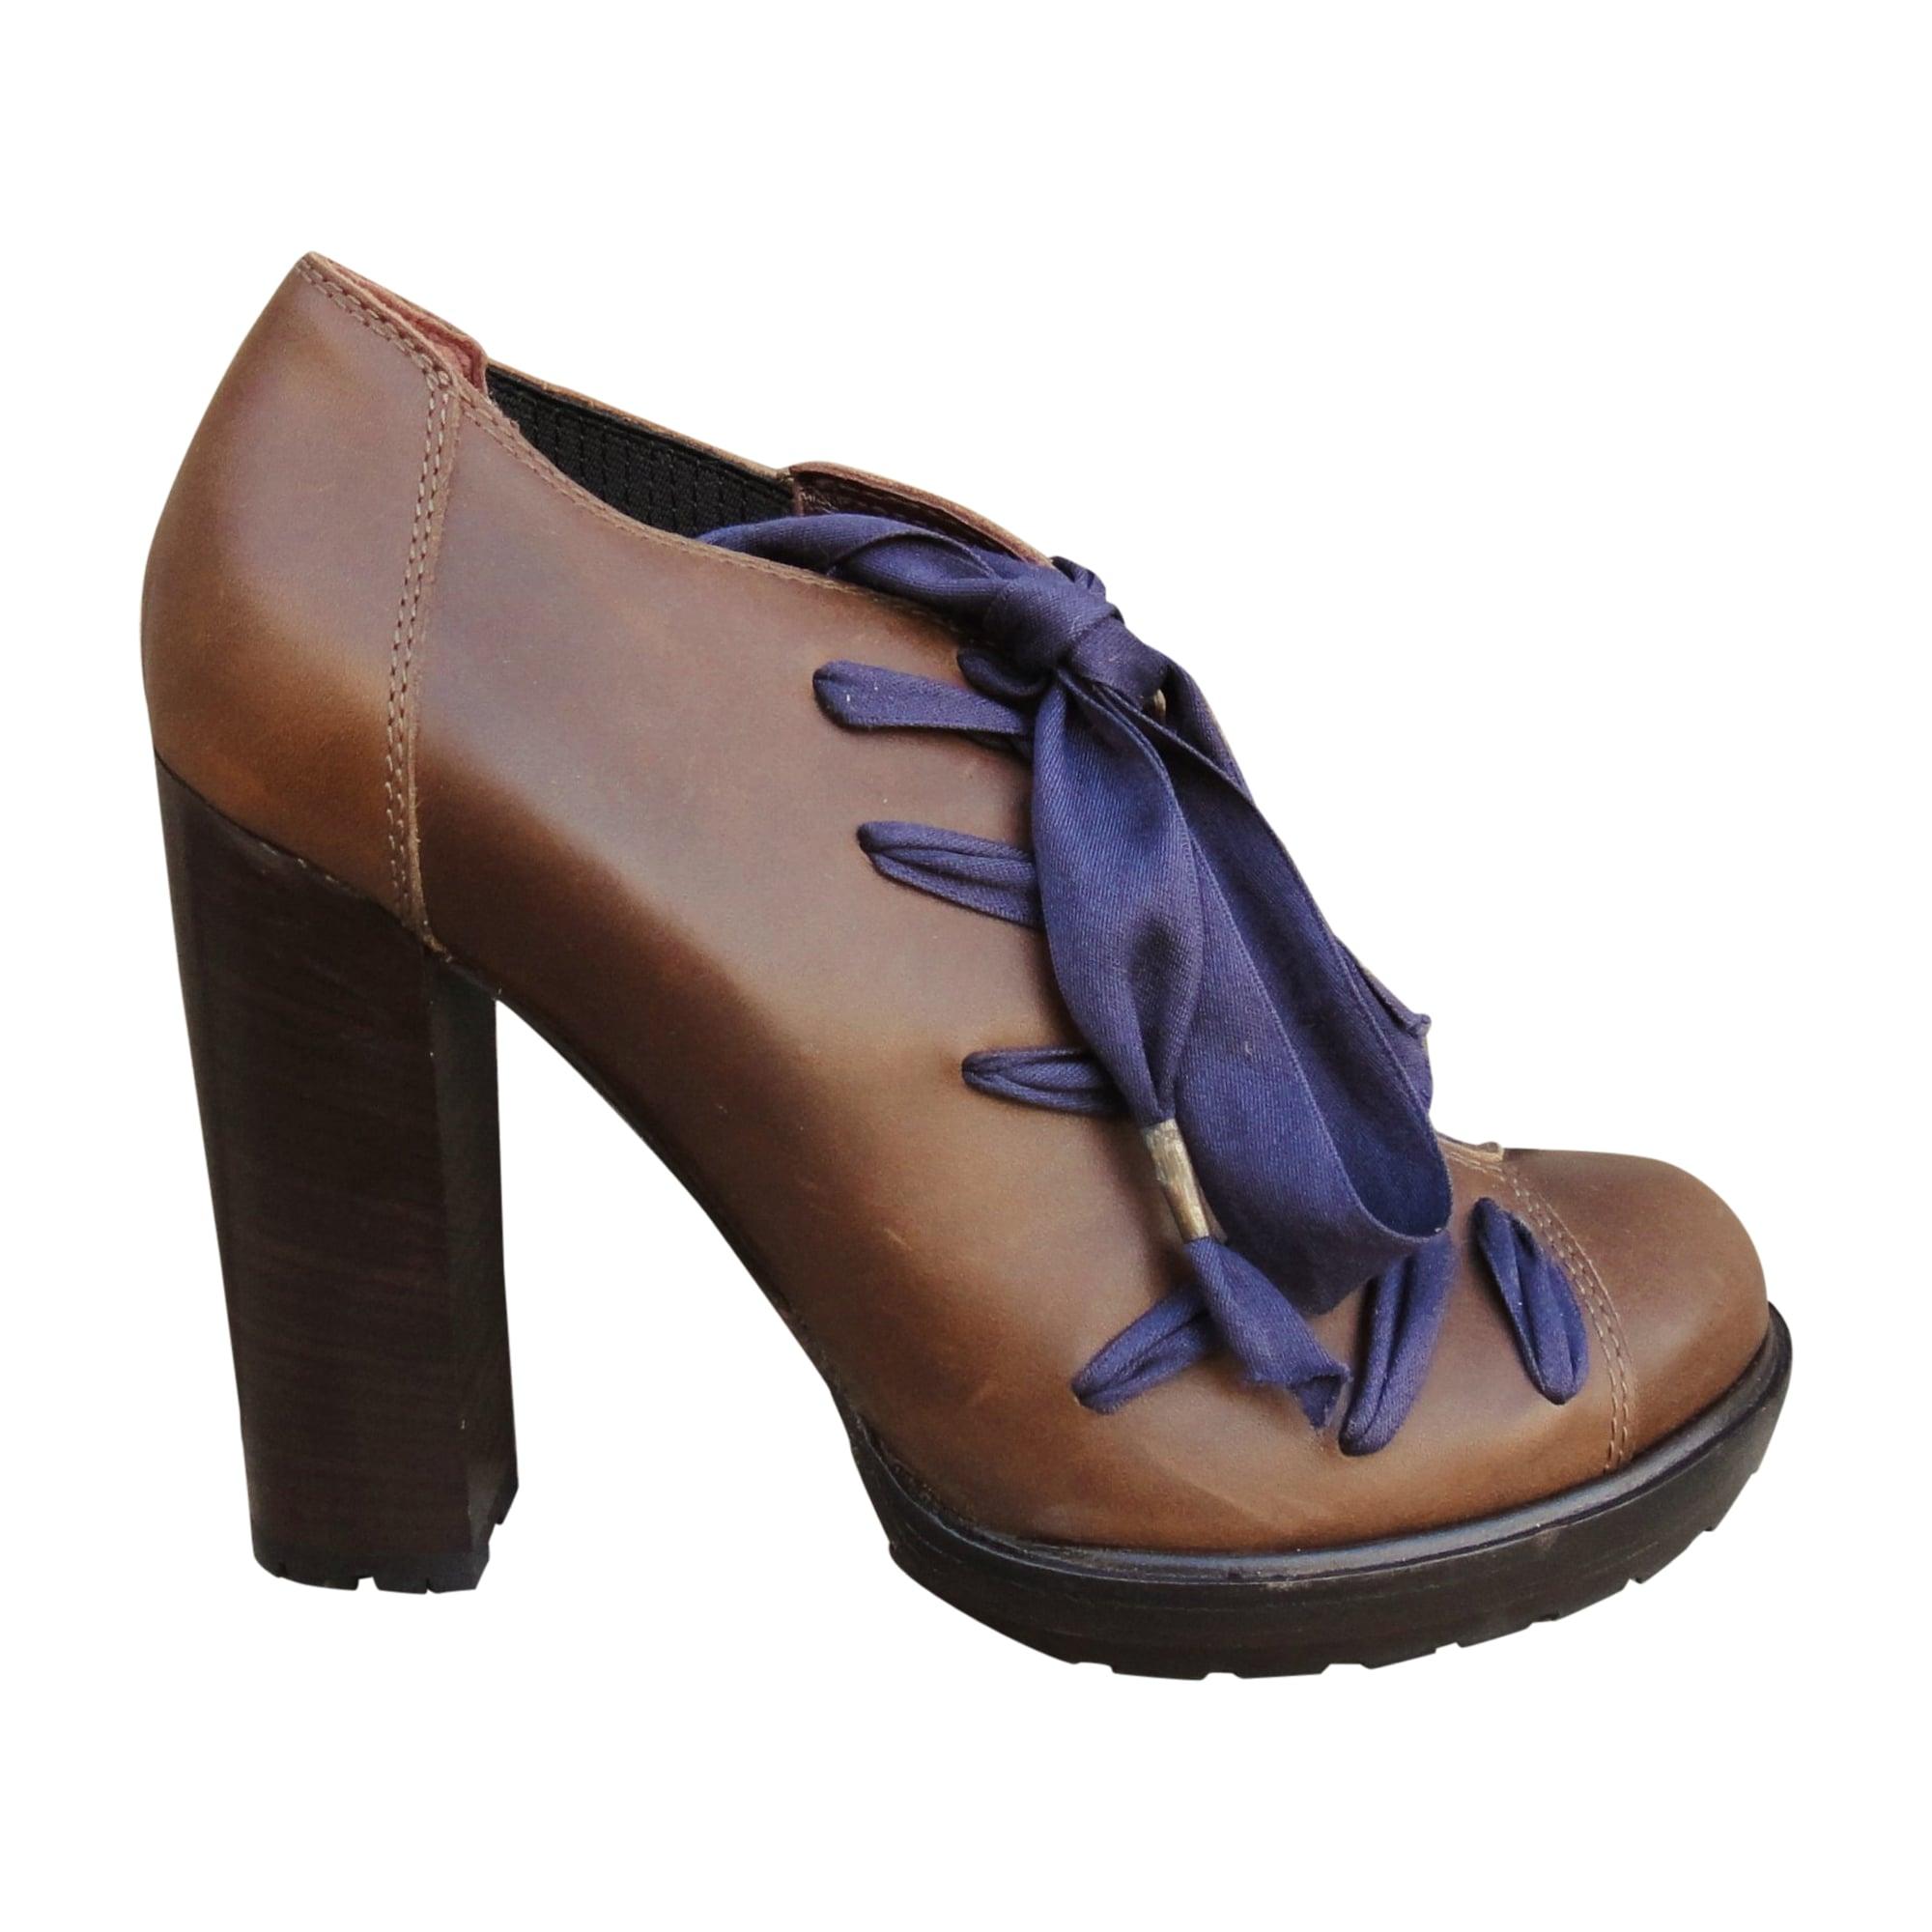 High Heel Ankle Boots VANESSA BRUNO Brown